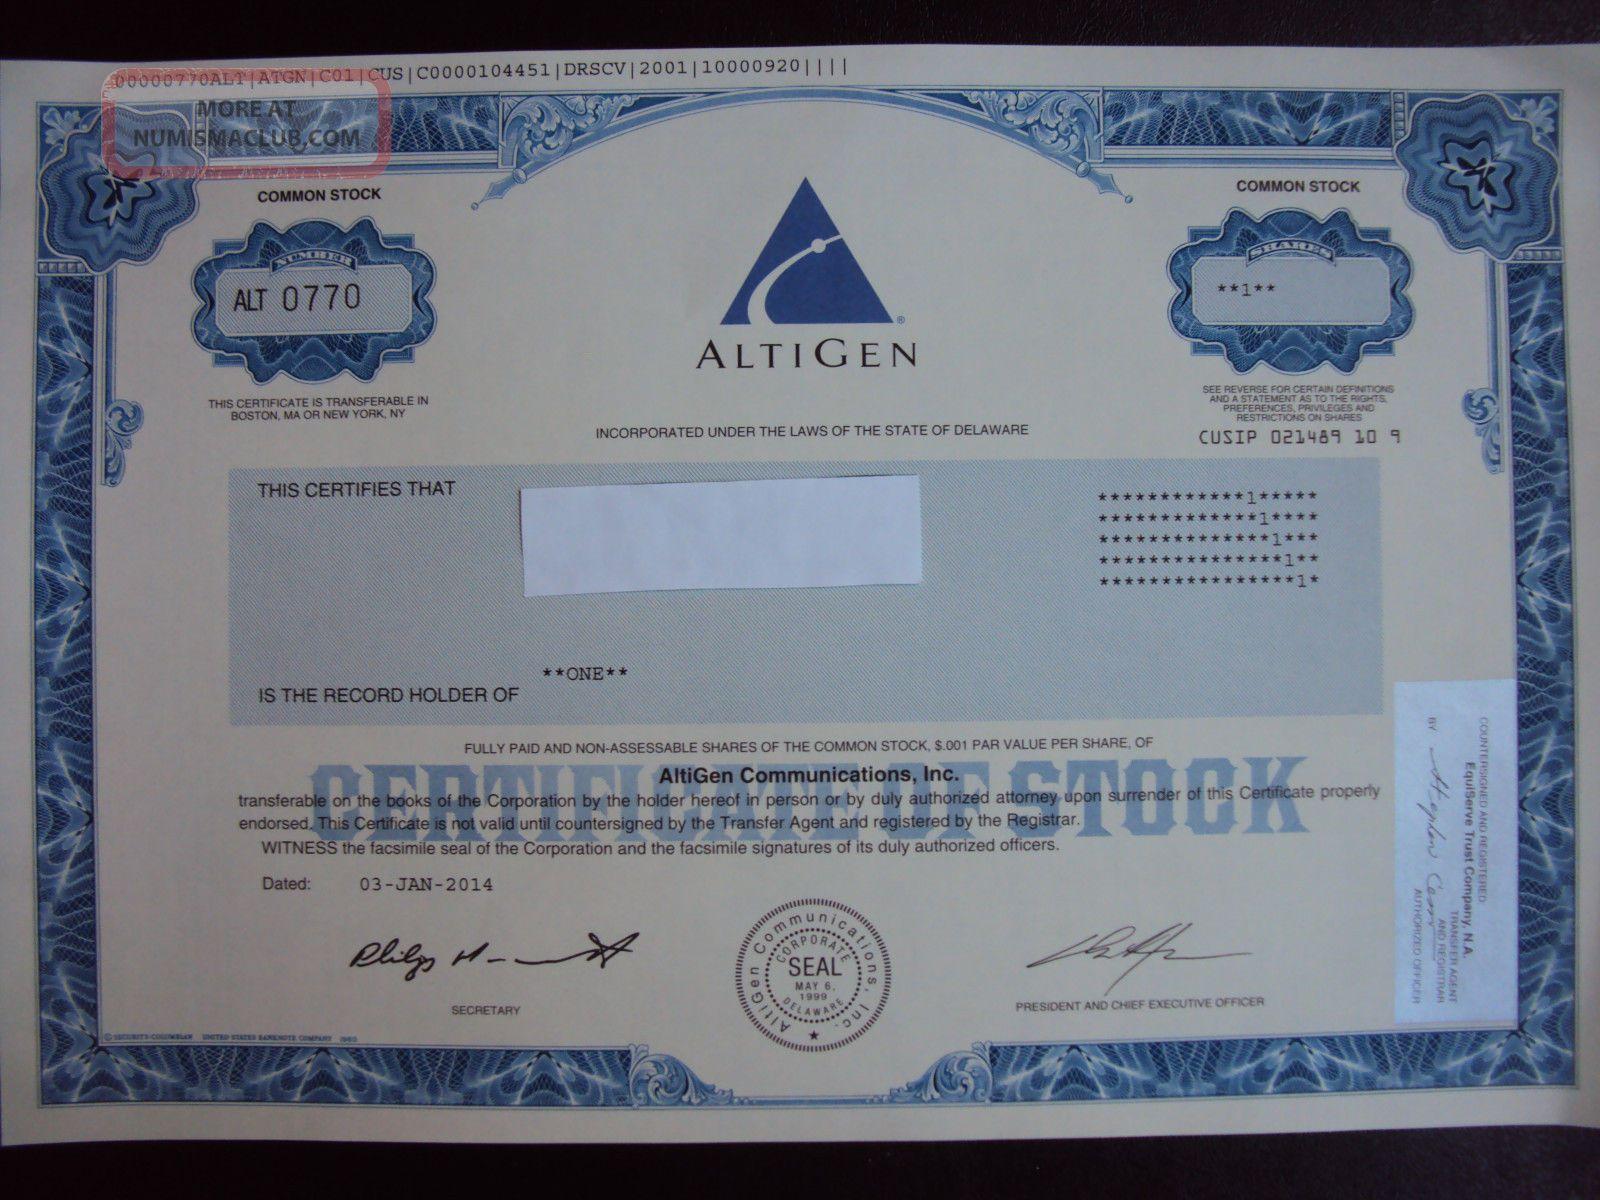 Altigen Communications Stock Certificate Stocks & Bonds, Scripophily photo